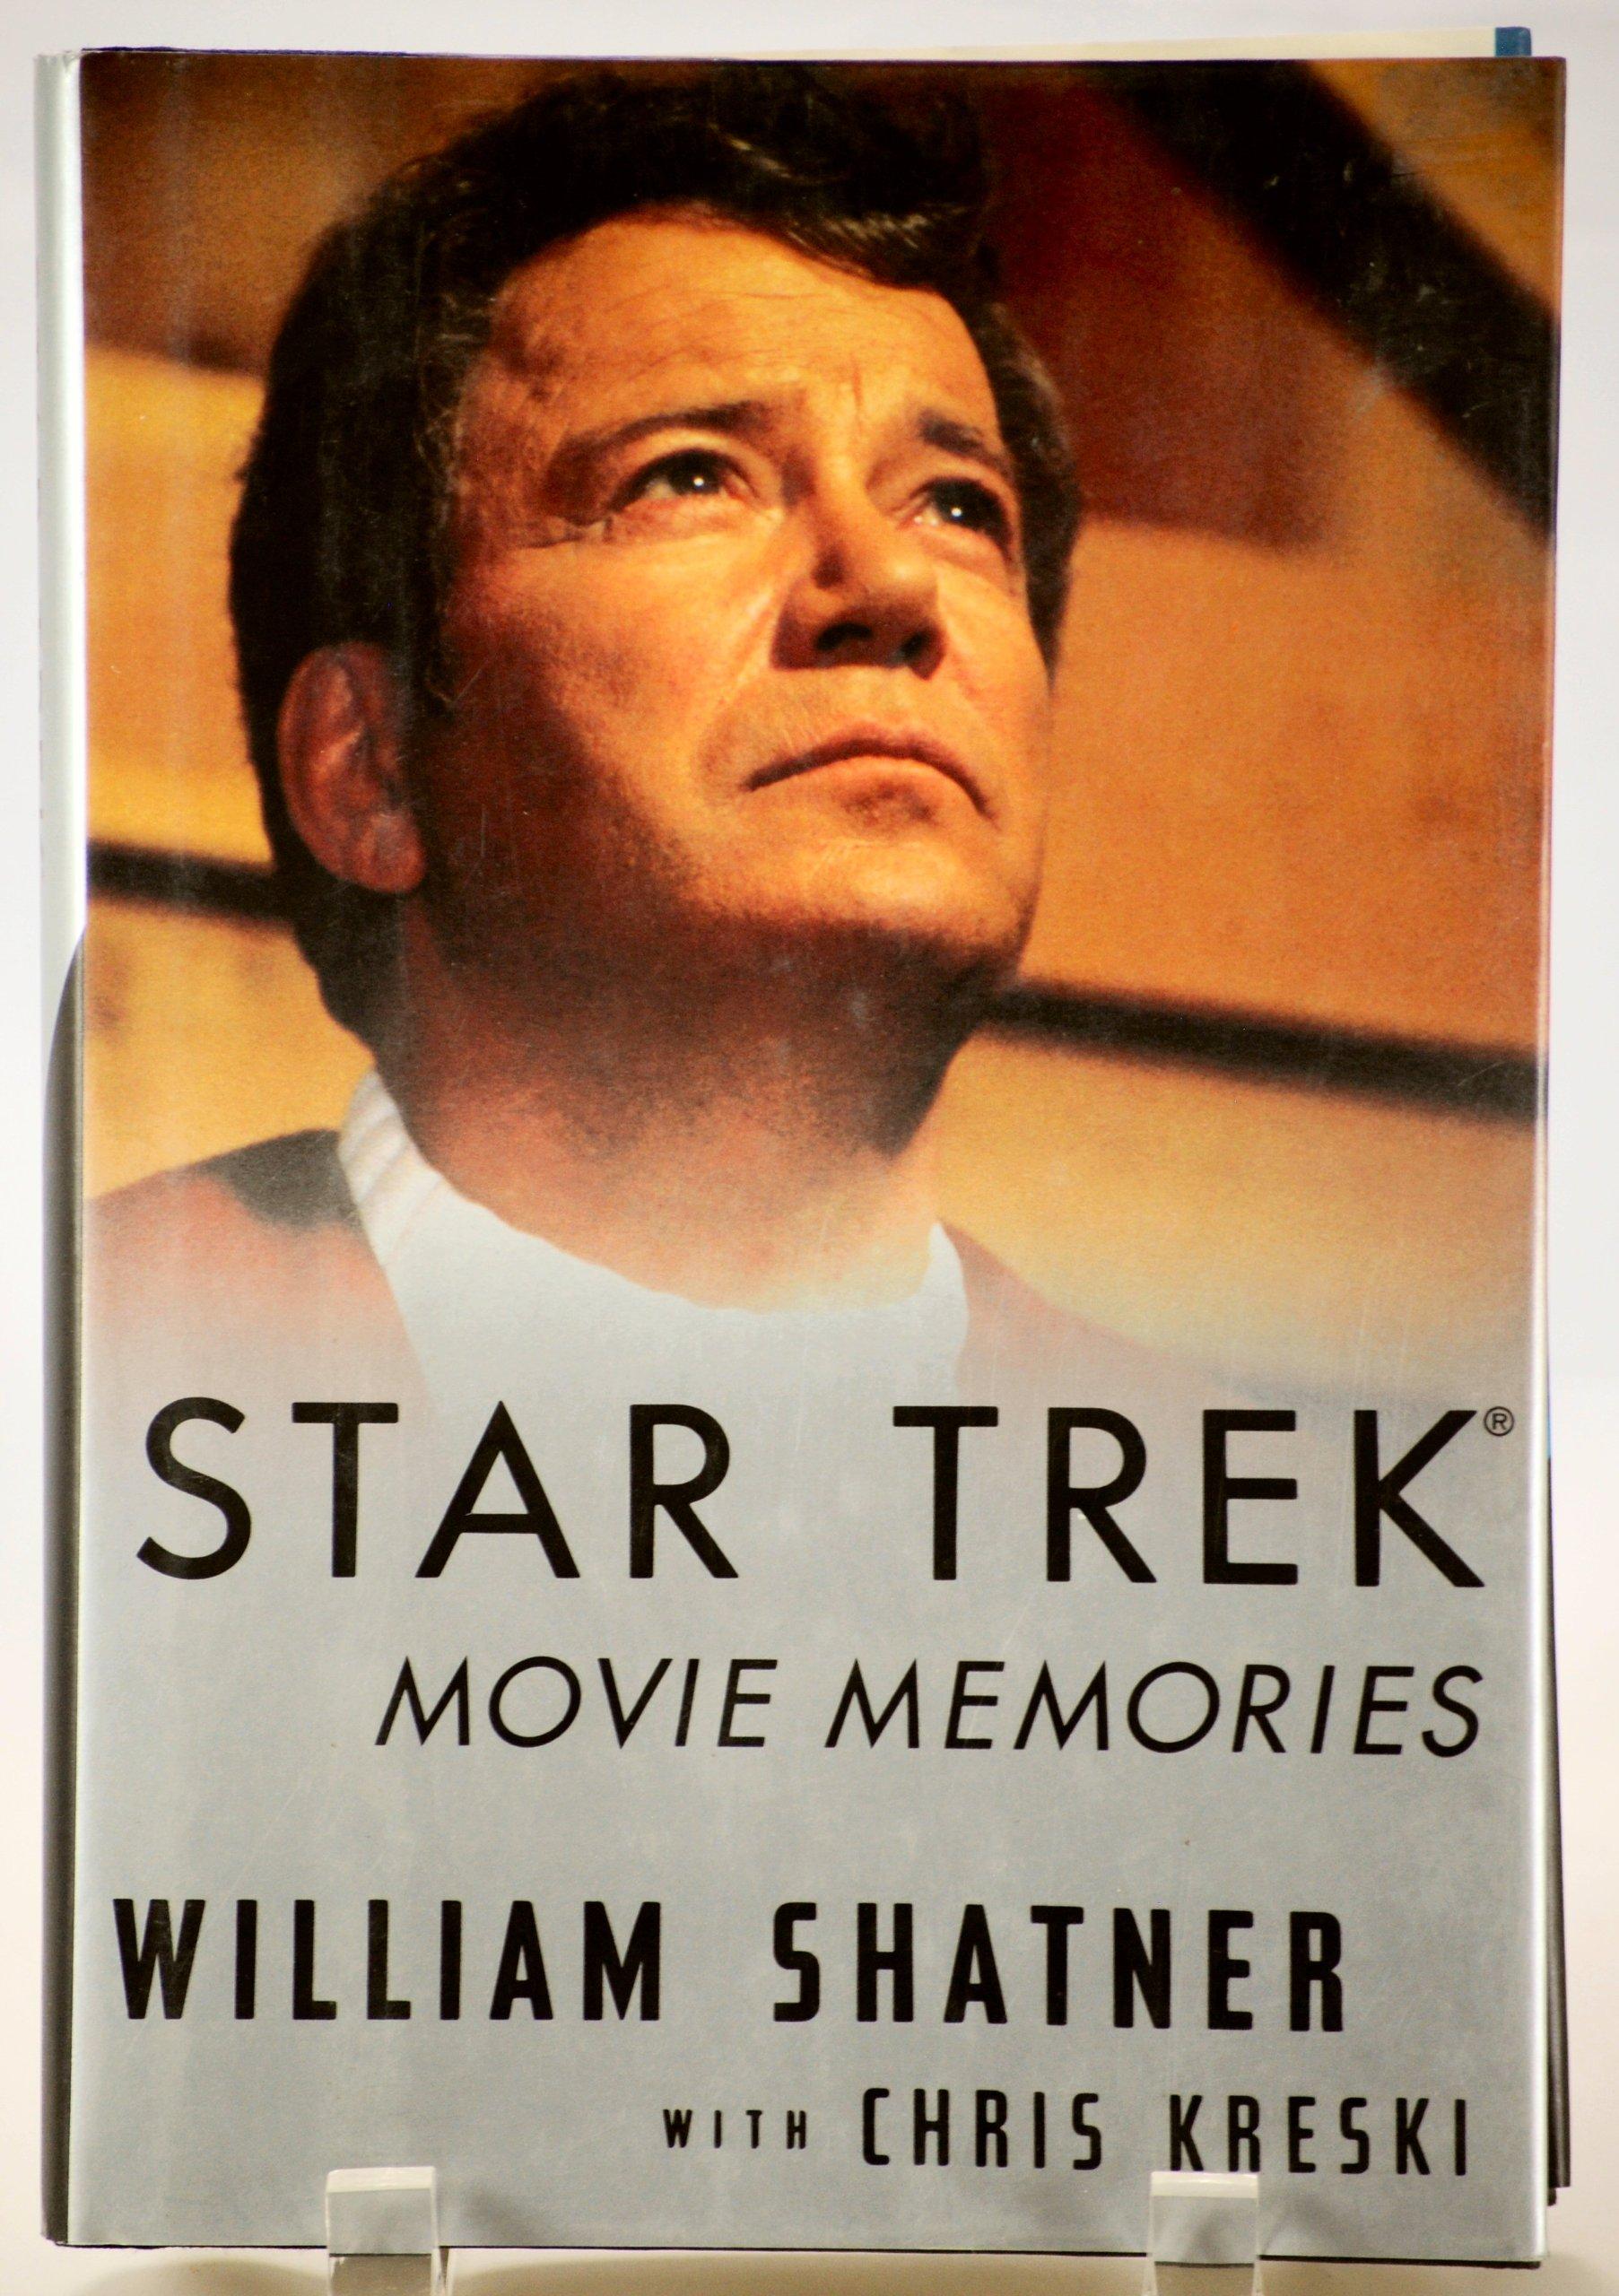 Star Trek Movie Memories: William Shatner, Chris Kreski: 9780060176174:  Amazon.com: Books